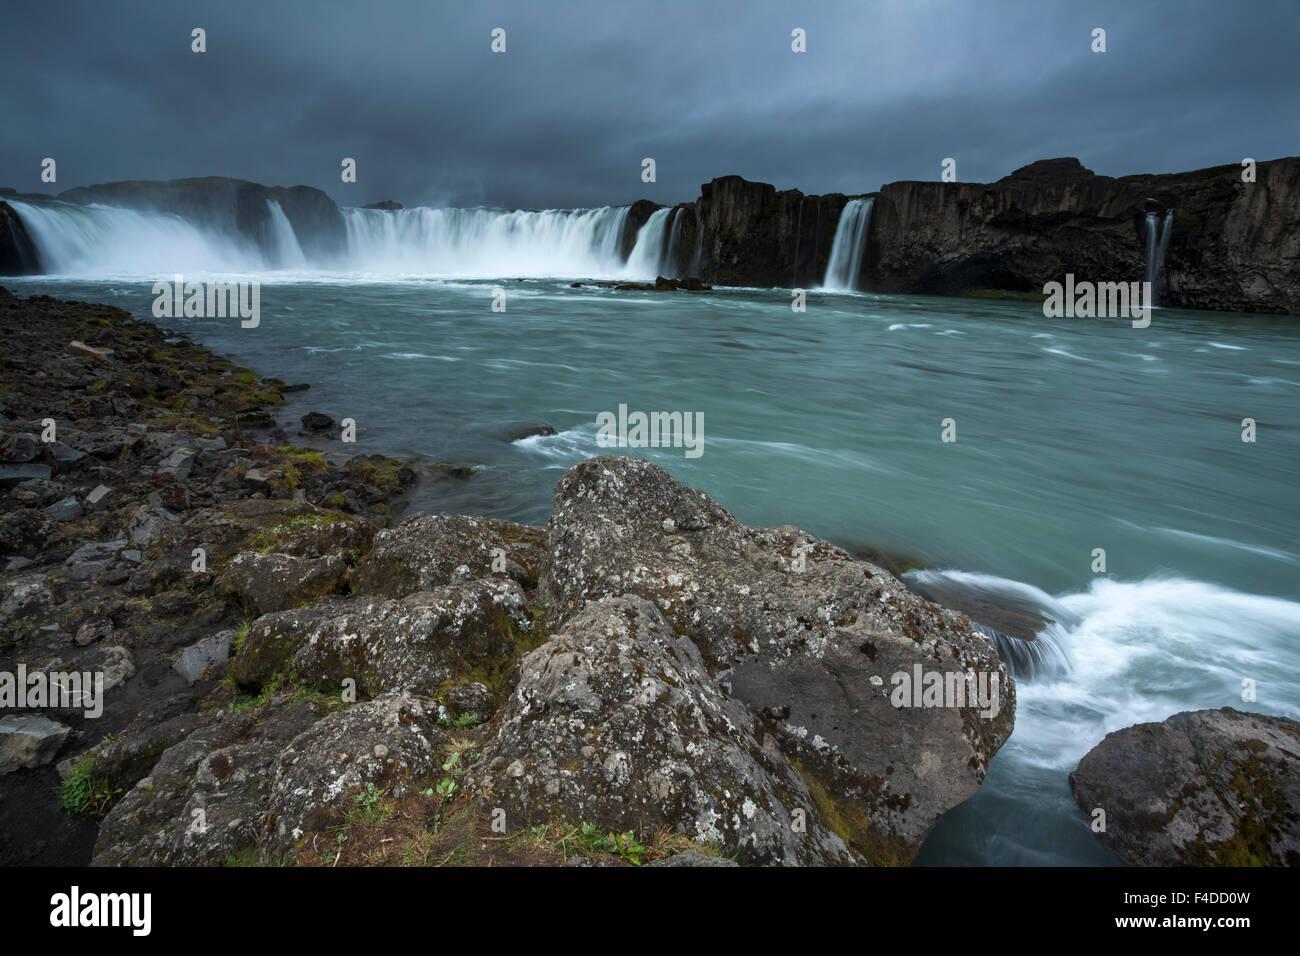 Cascate Godafoss e fiume Skjalfandafljot, Nordhurland Eystra, Islanda. Immagini Stock